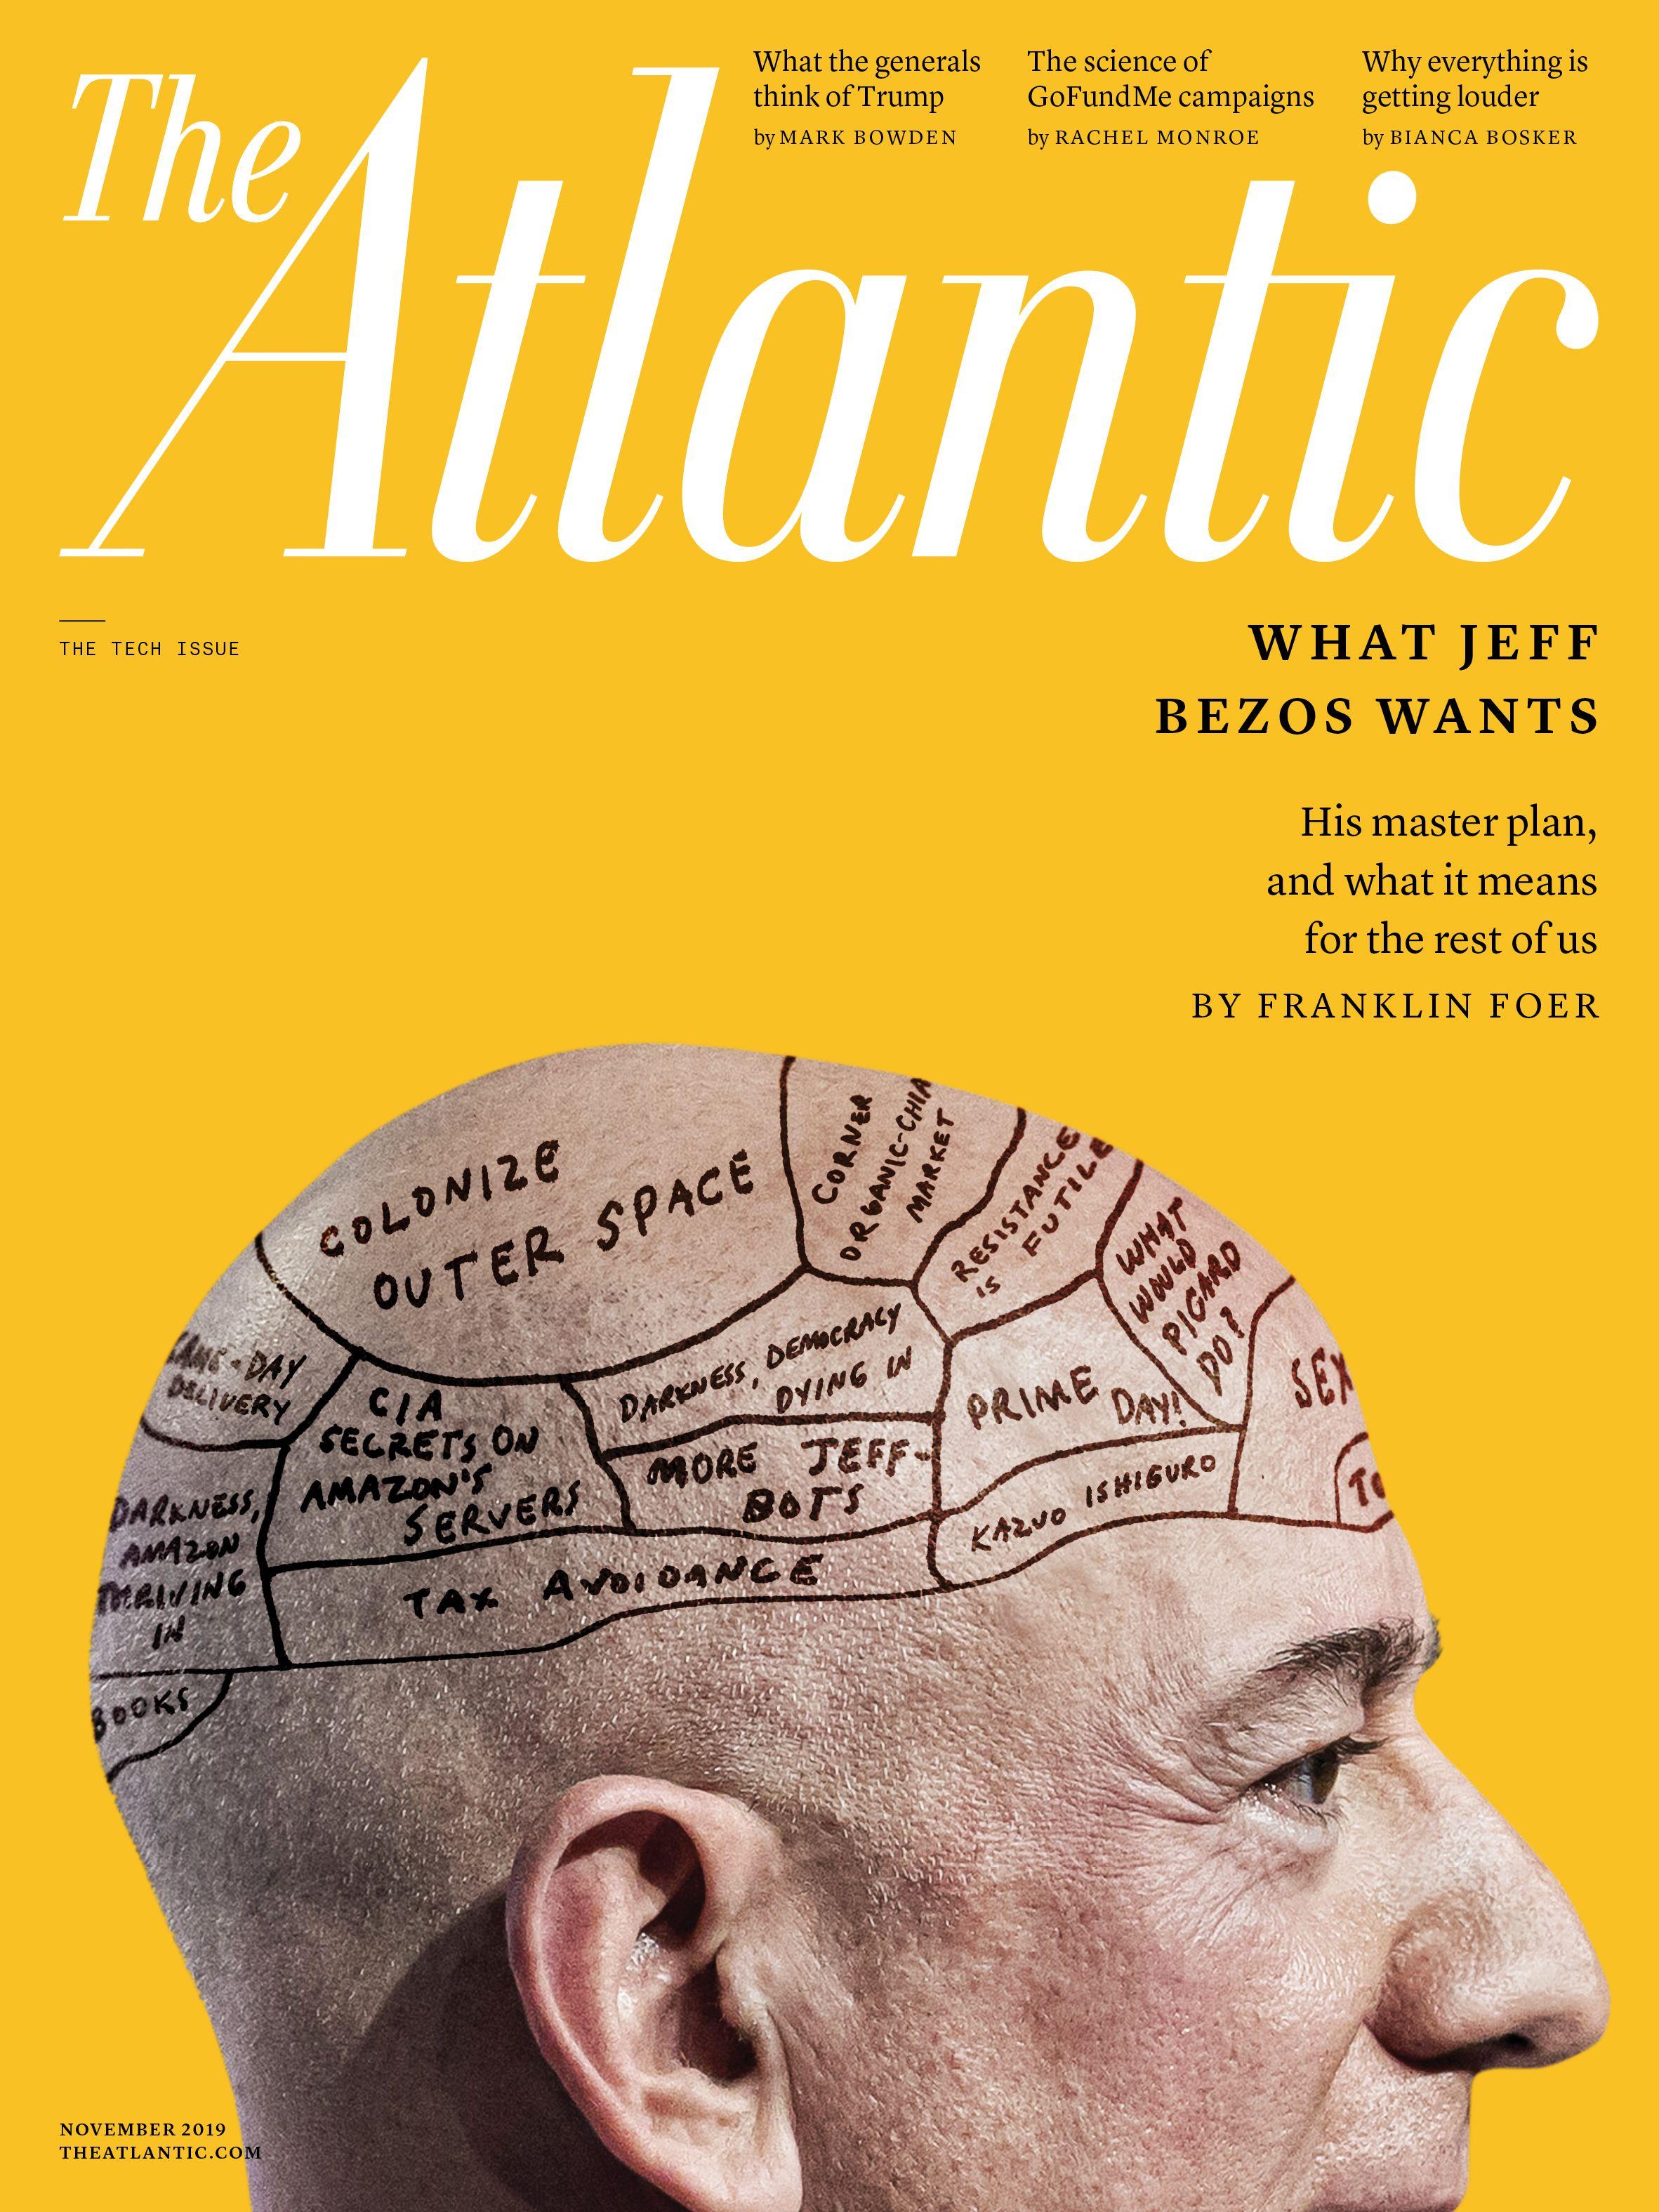 Jeff Bezos S Master Plan Magazine Modest Proposal Atlas